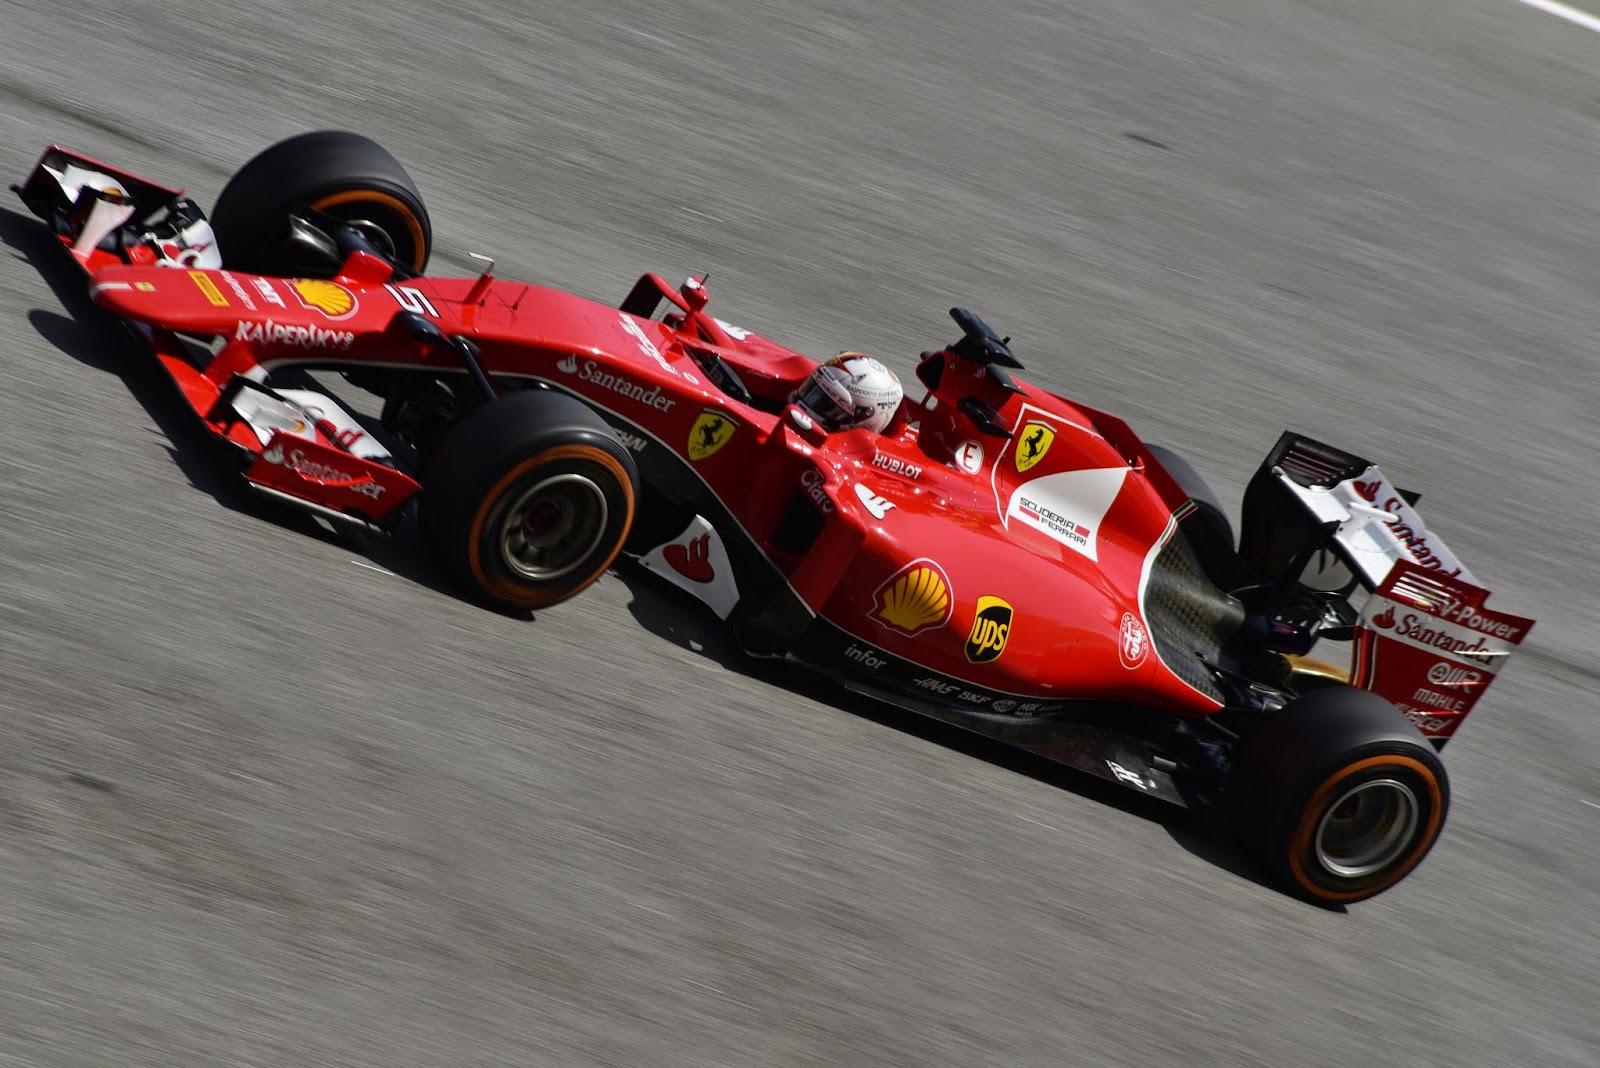 Motorsport racing with Sebastian Vettel in Malaysia